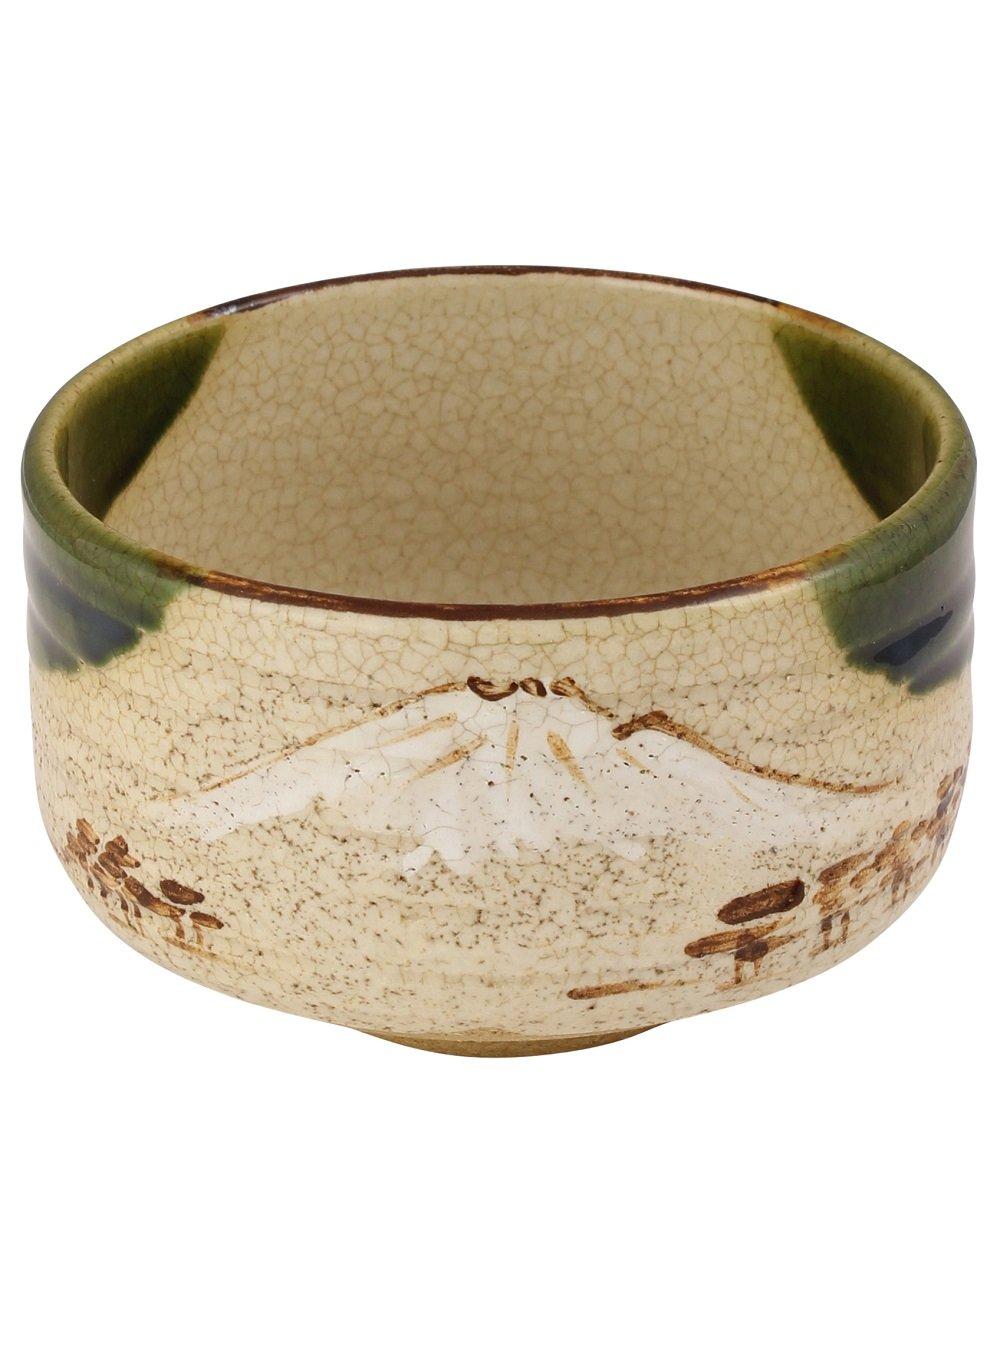 DOCTOR KING Artisan Japanese Matcha Bowl | Chawan | Mino-Yaki (Oribe Ware) | Made in Japan | Light Brown with White Mountain